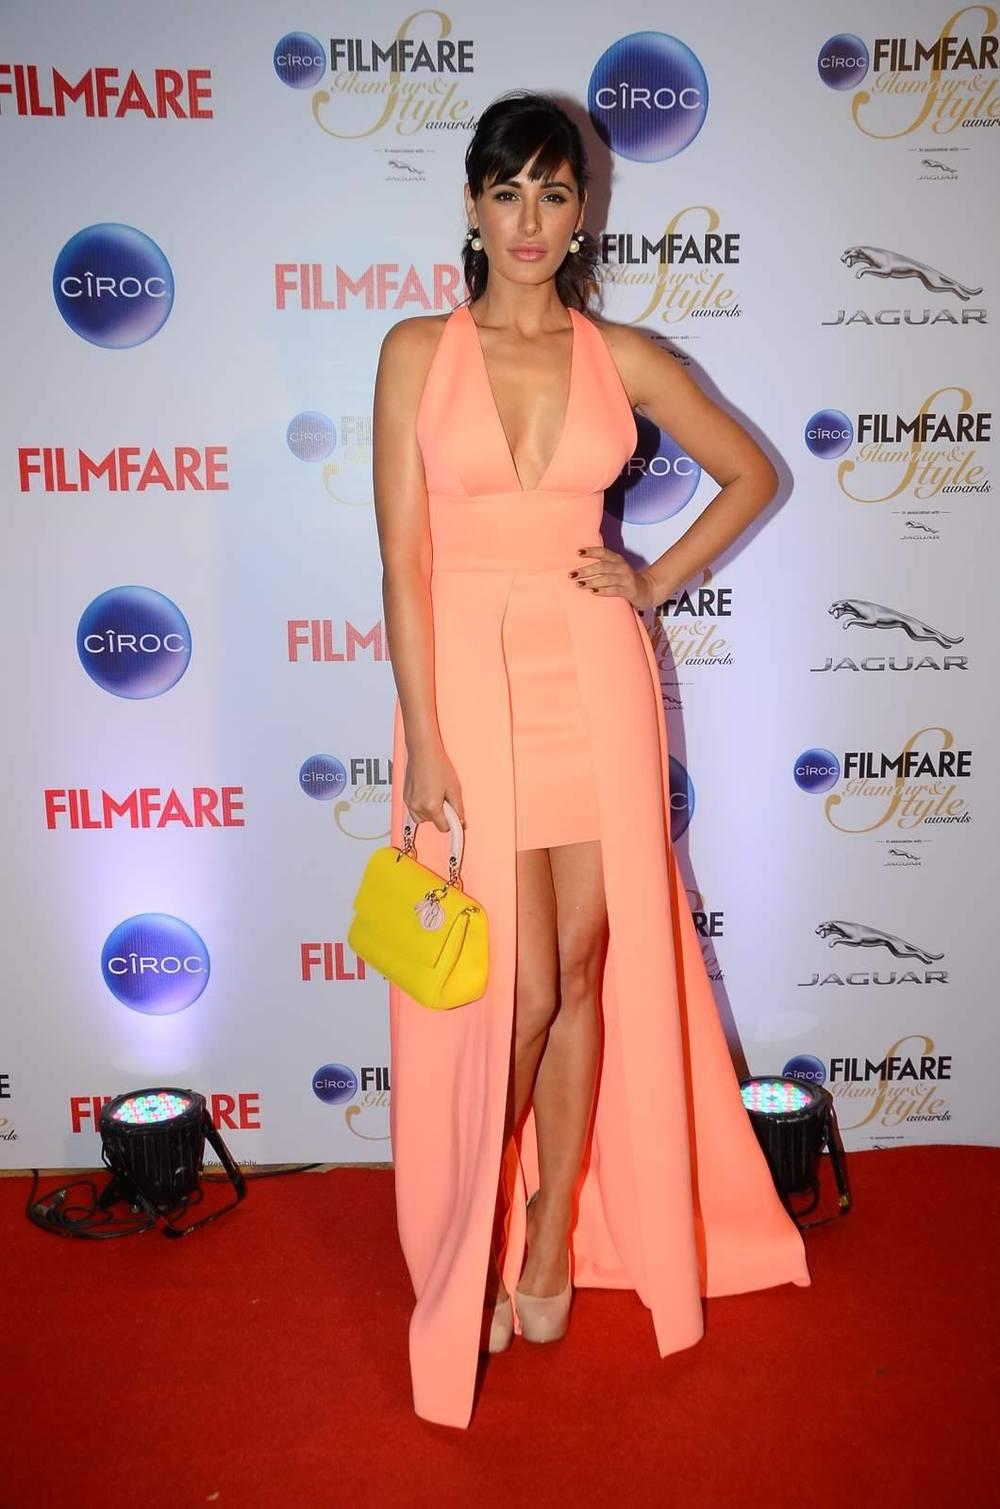 filmfare-style-awards-nargis-gauri-nainika-dior.jpg